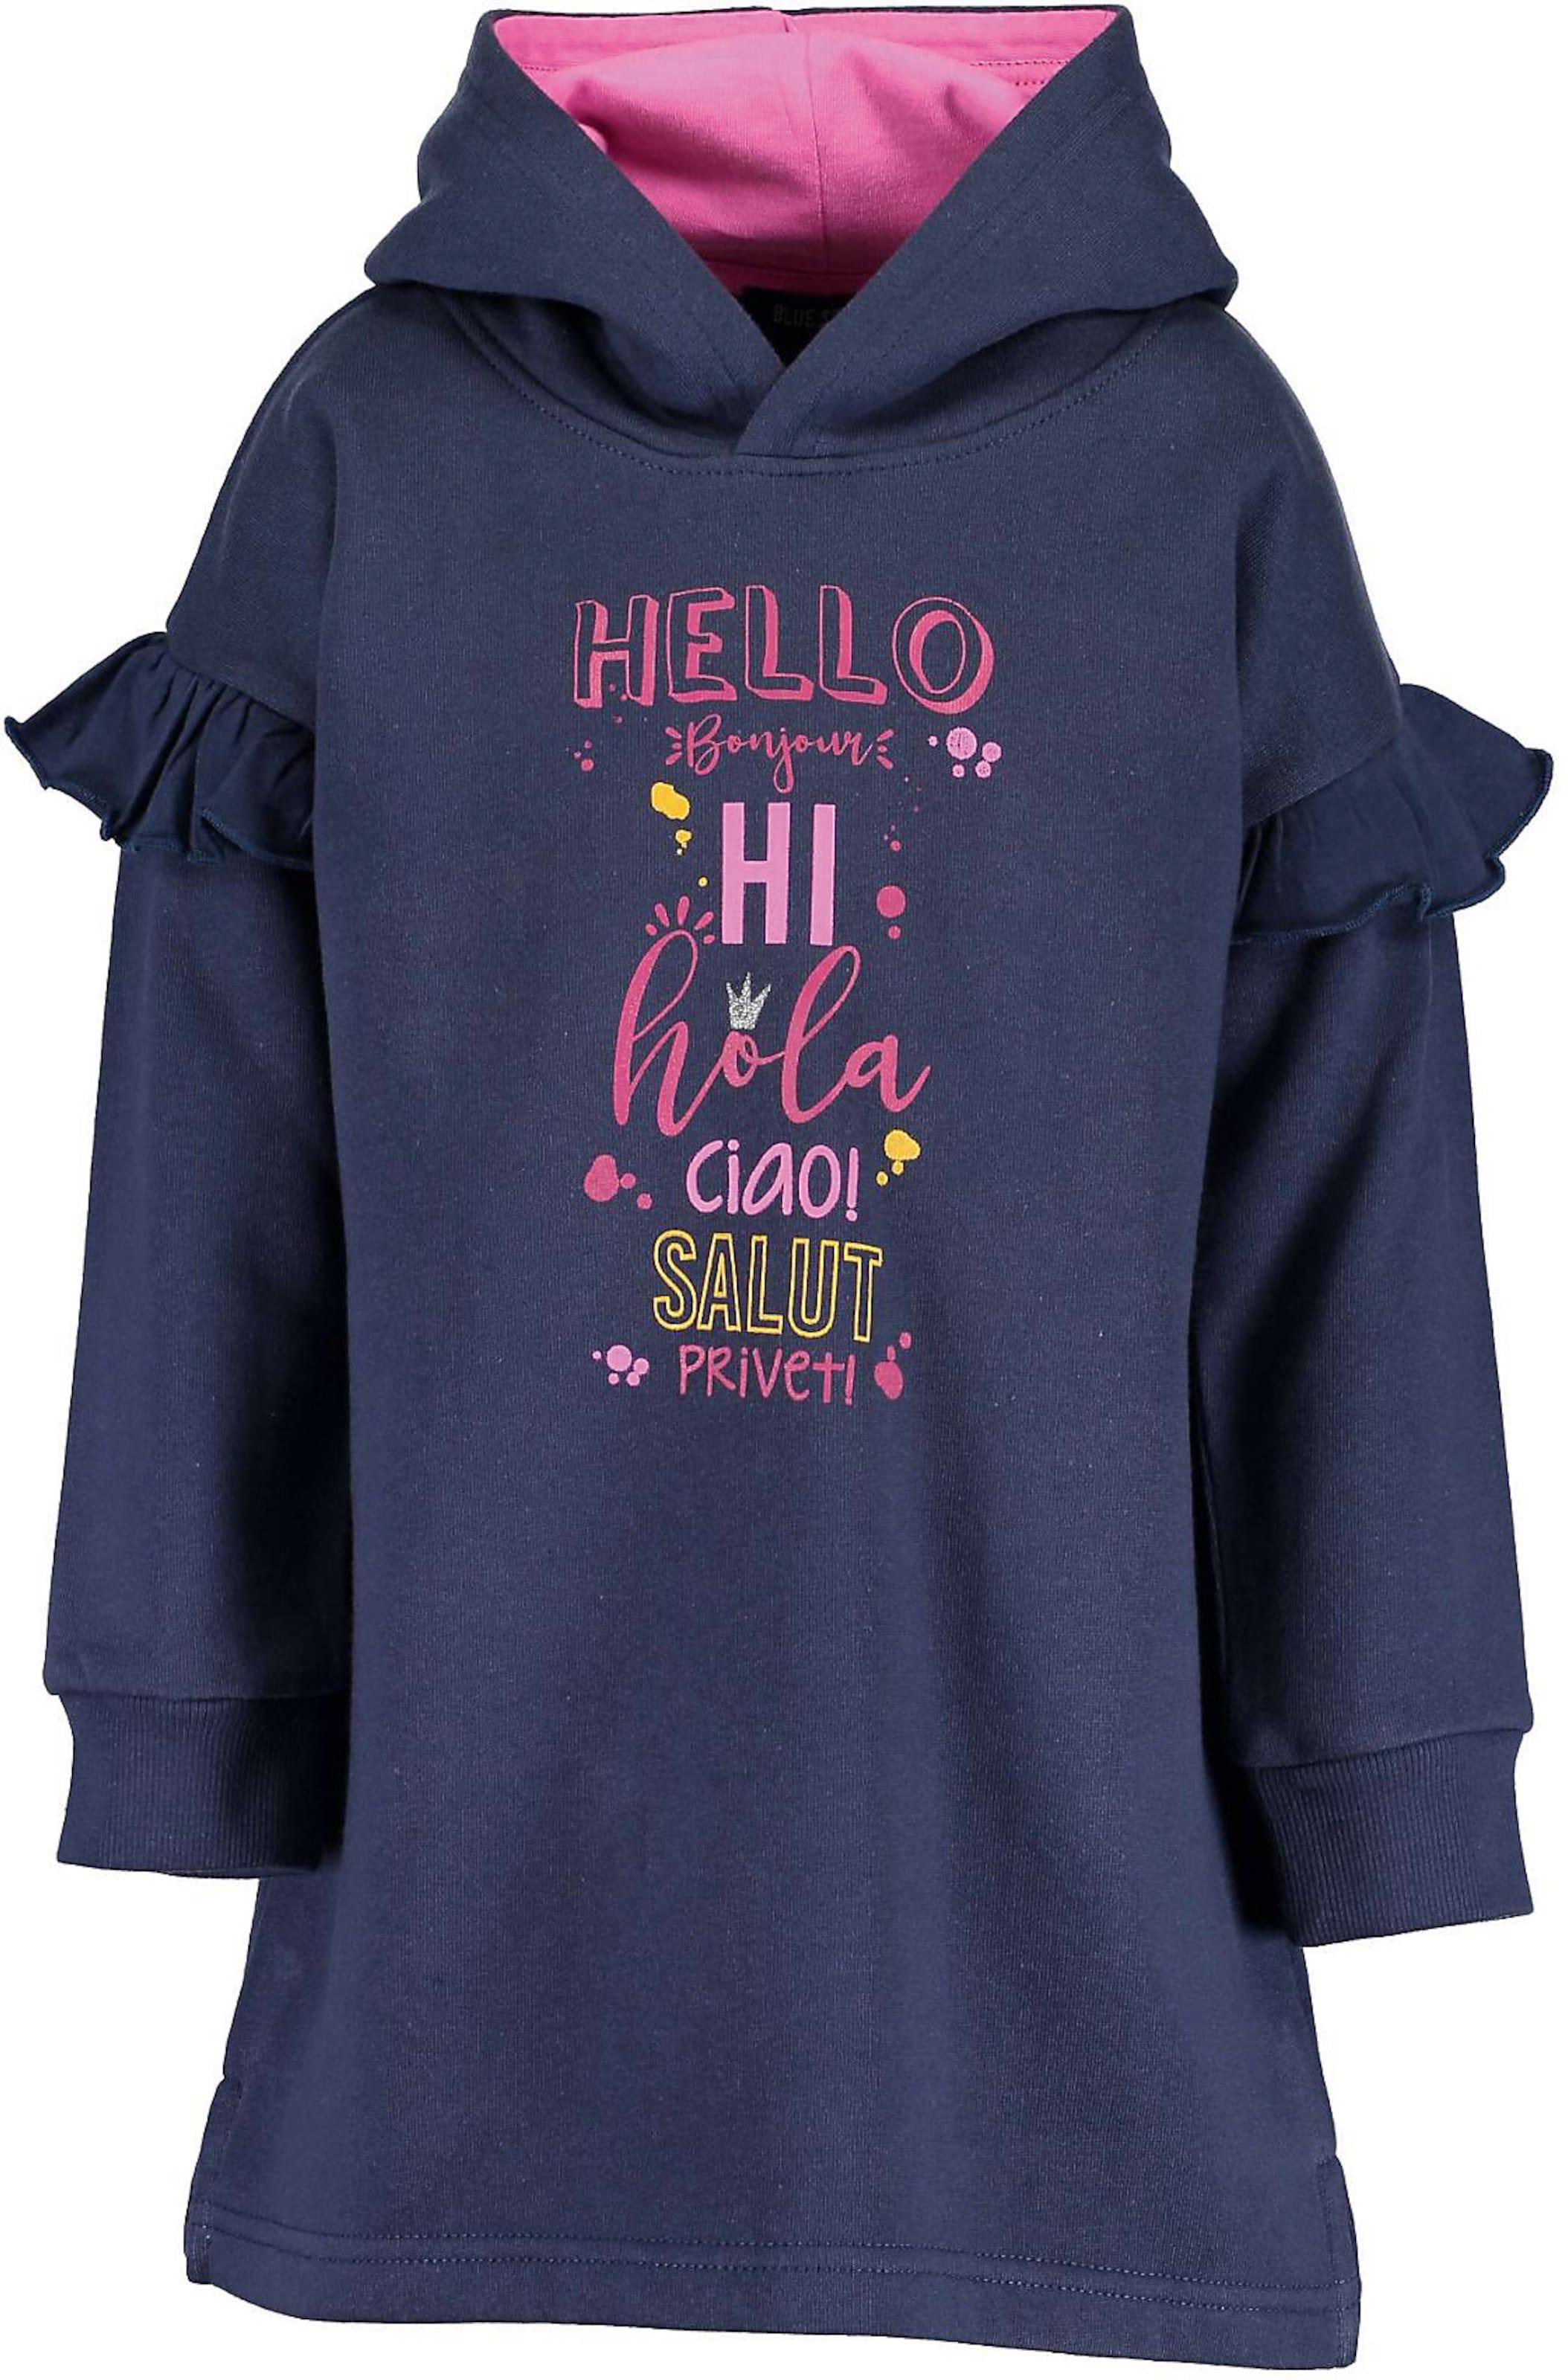 Kinder,  Mädchen,  Kinder BLUE SEVEN Sweatkleid blau, grün,  olive, orange,  pink | 04055852715288